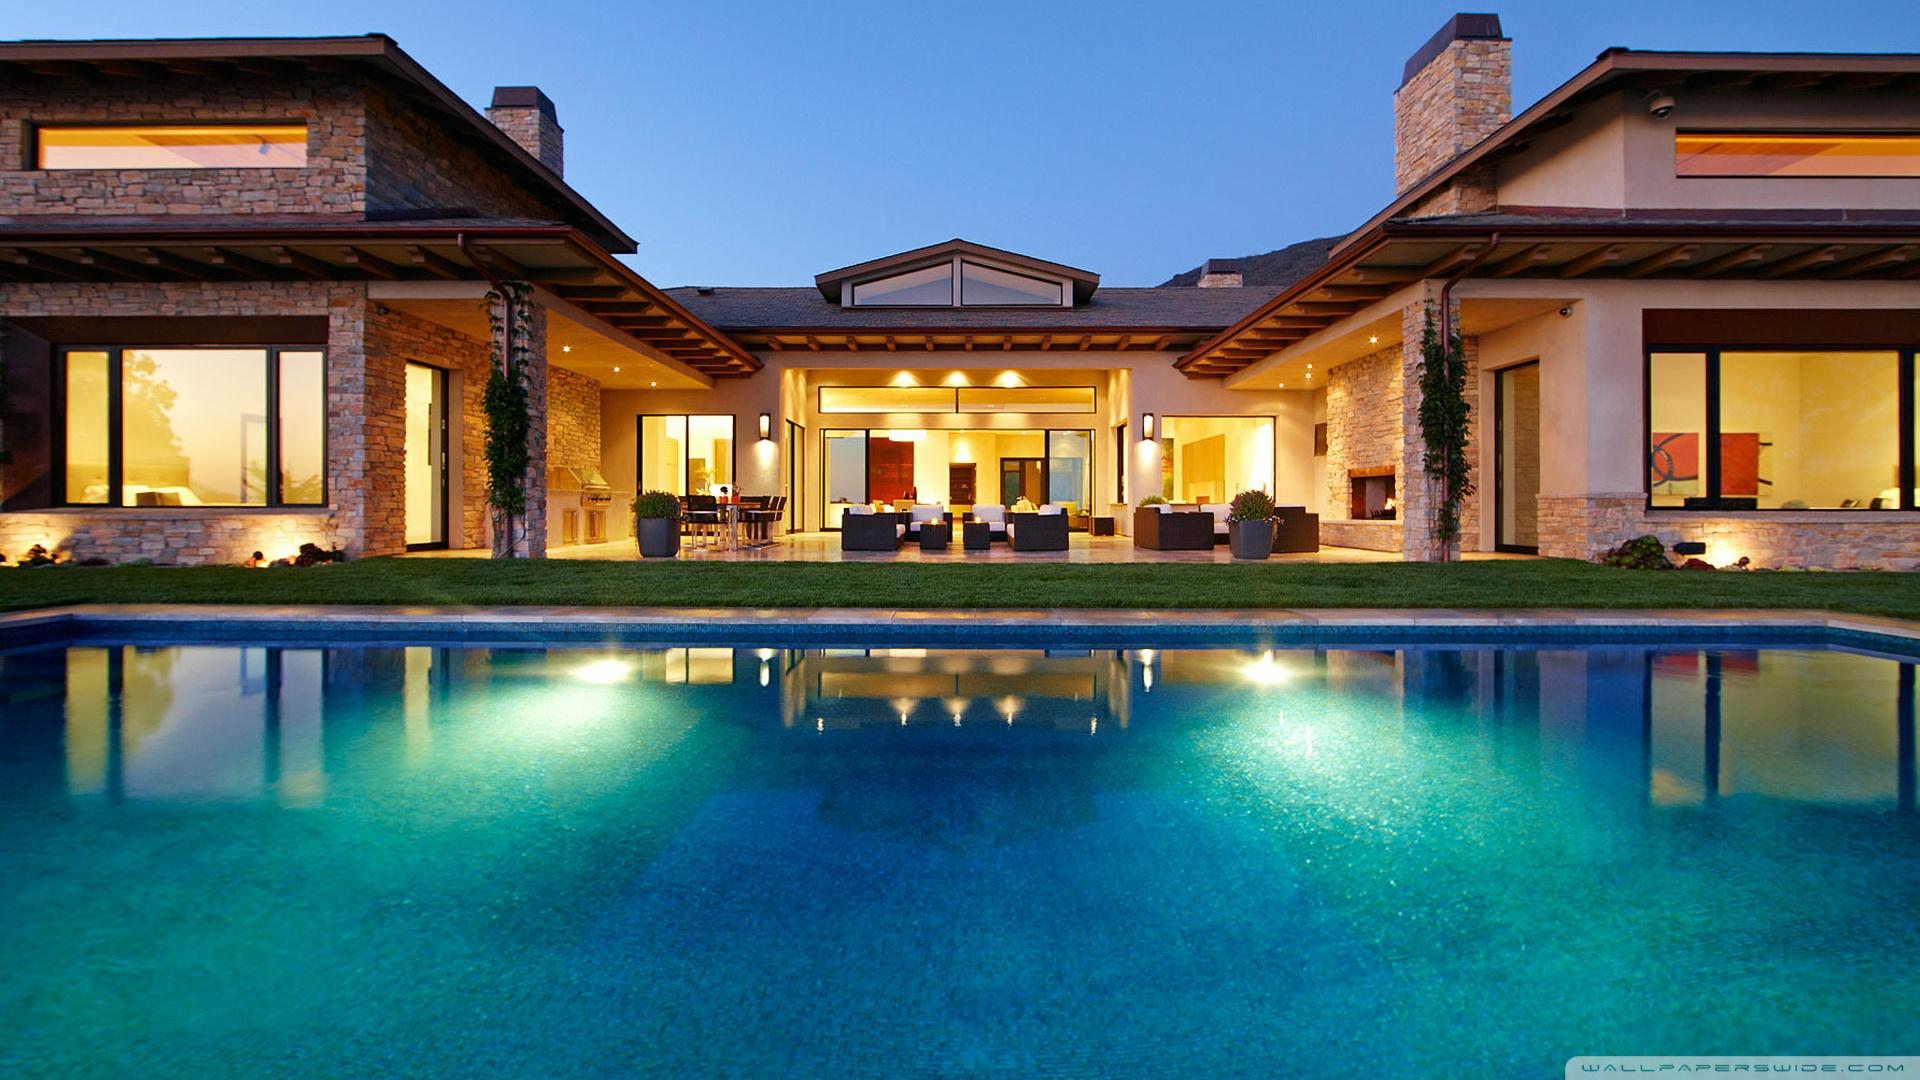 Modern Residence BK estates 1920x1080